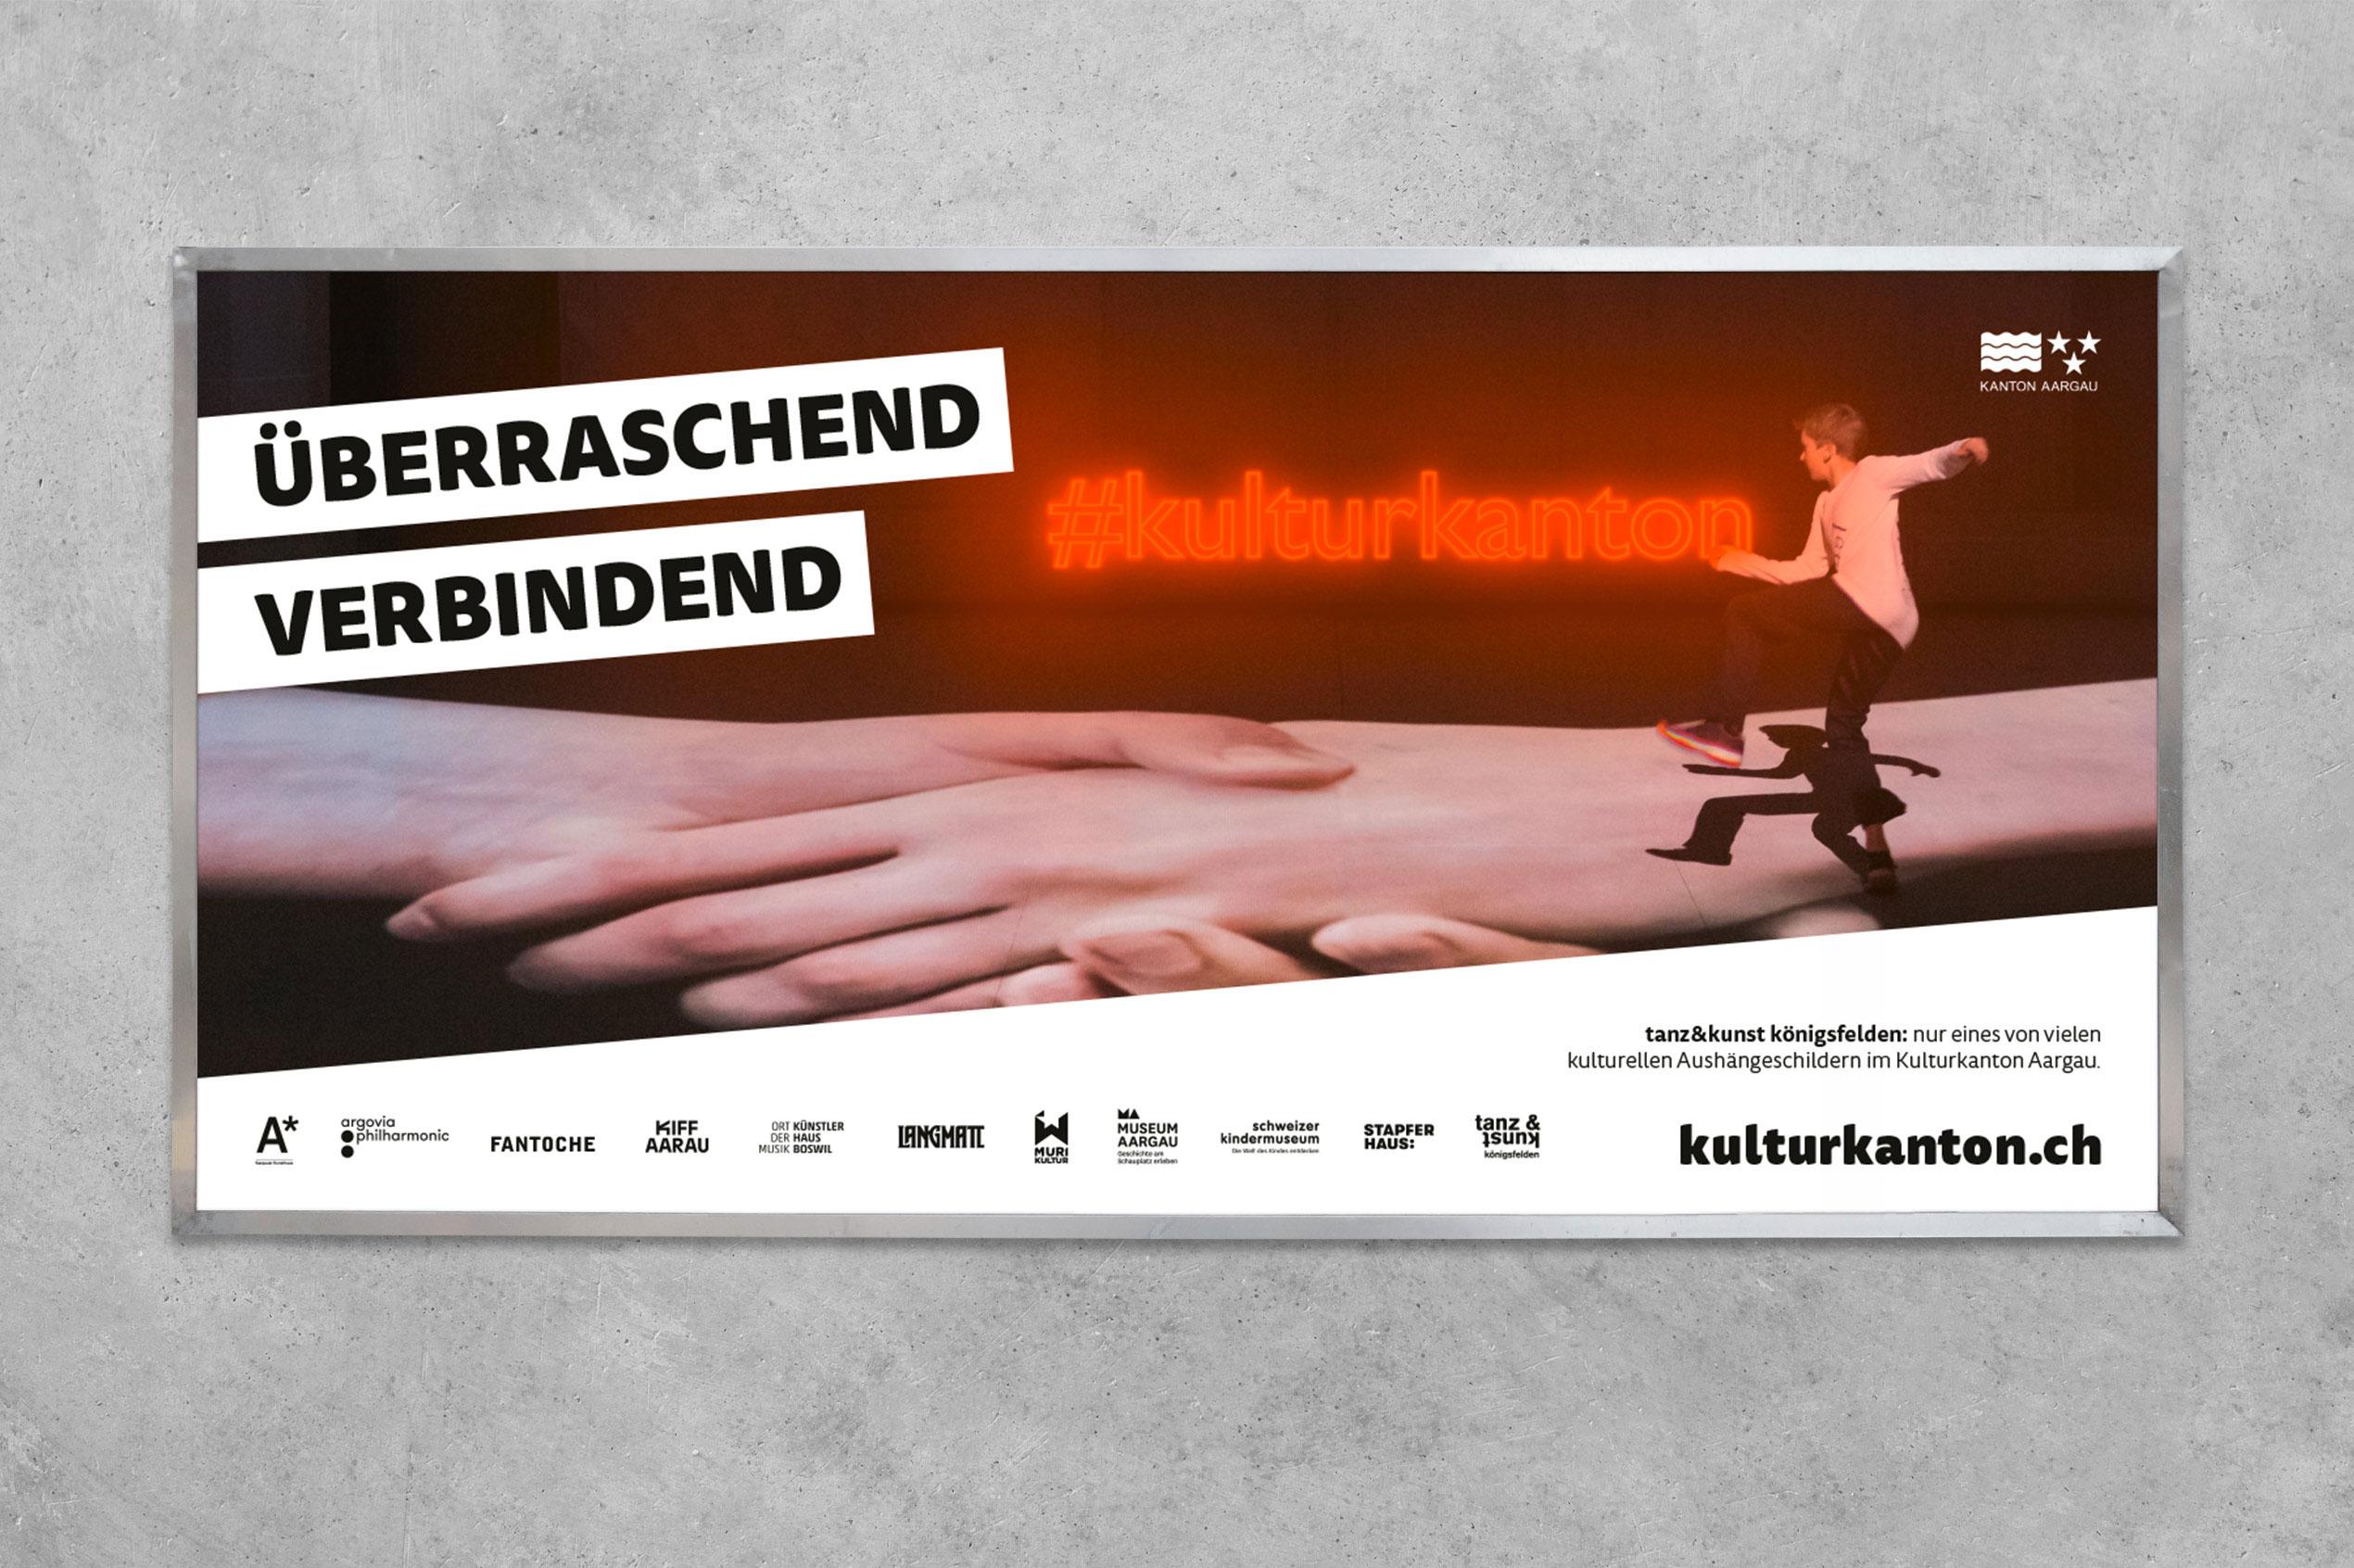 Kulturkanton, Plakat F12, Tanz & Kunst Kögigsfelden